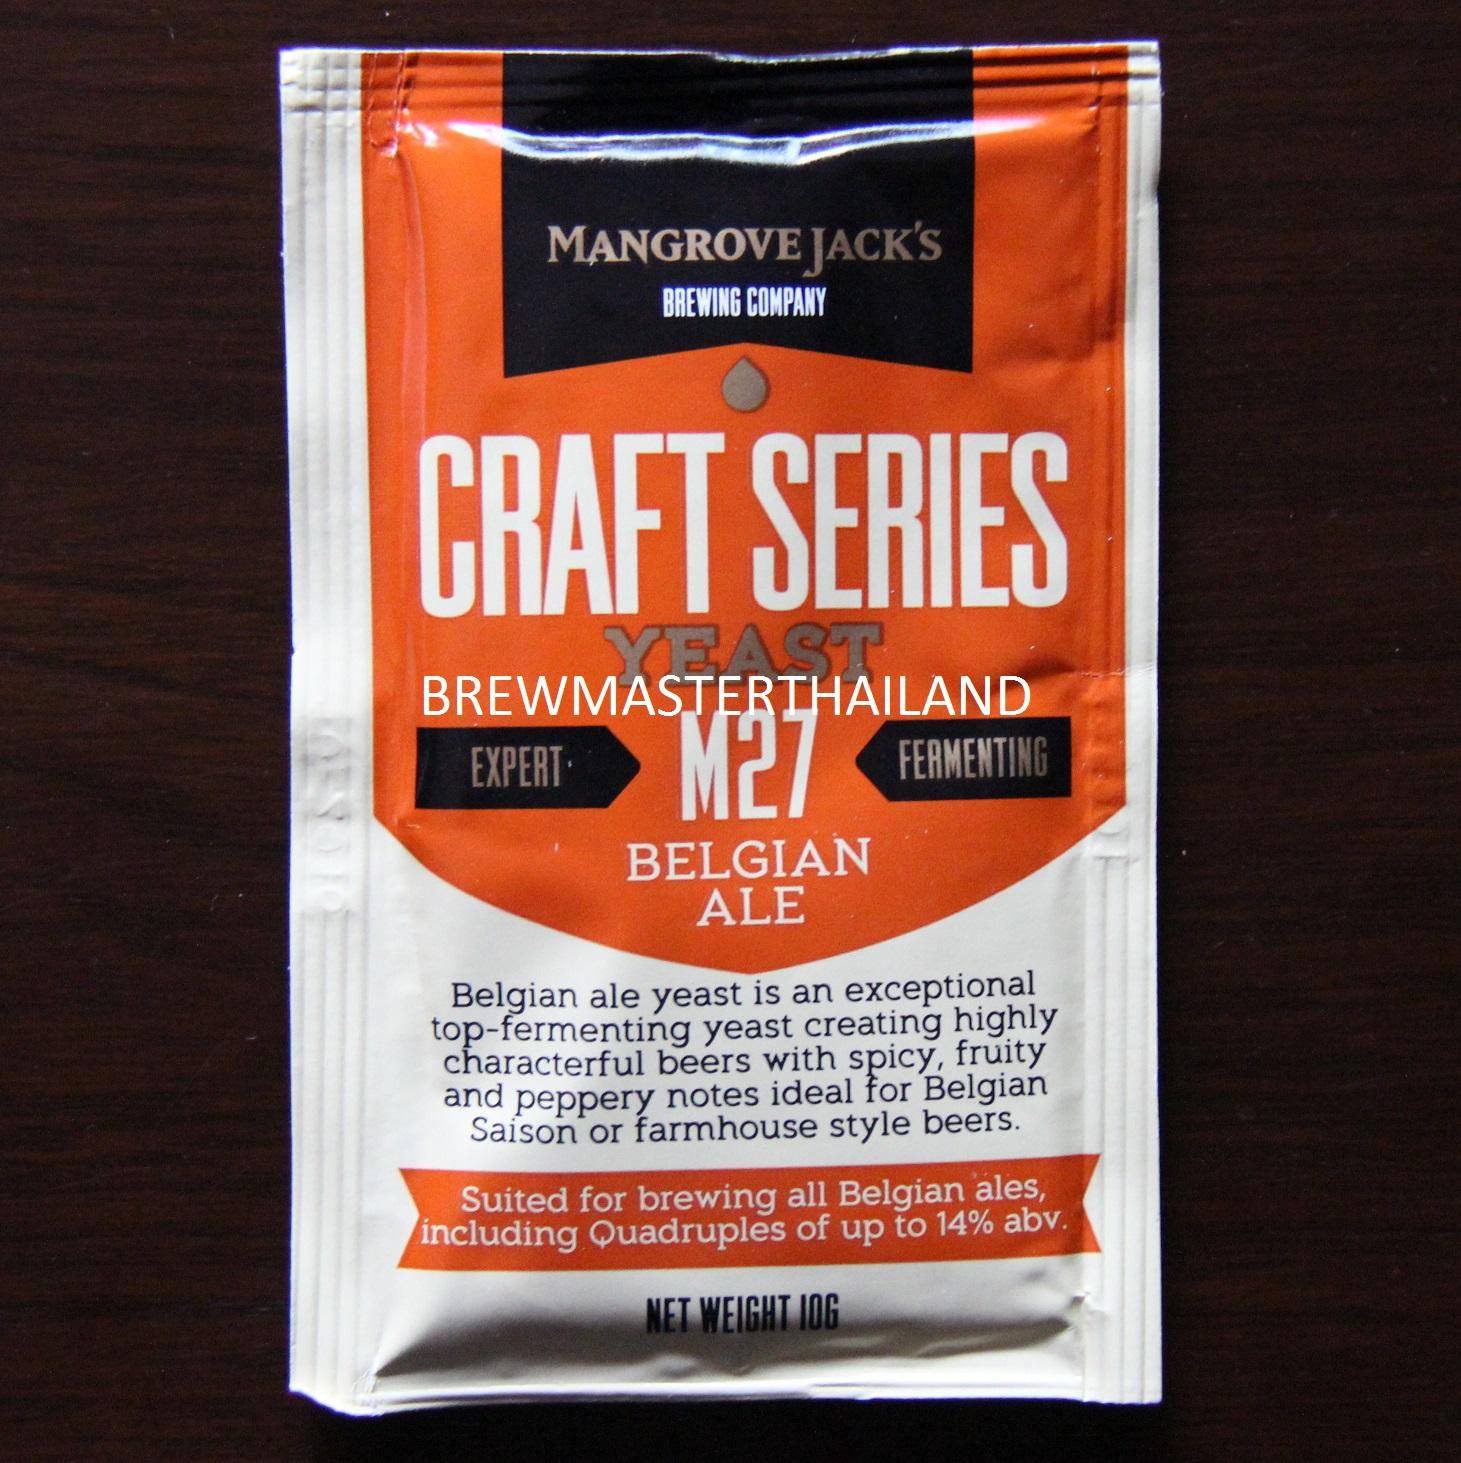 Mangrove Jack's - M27 Belgian Ale